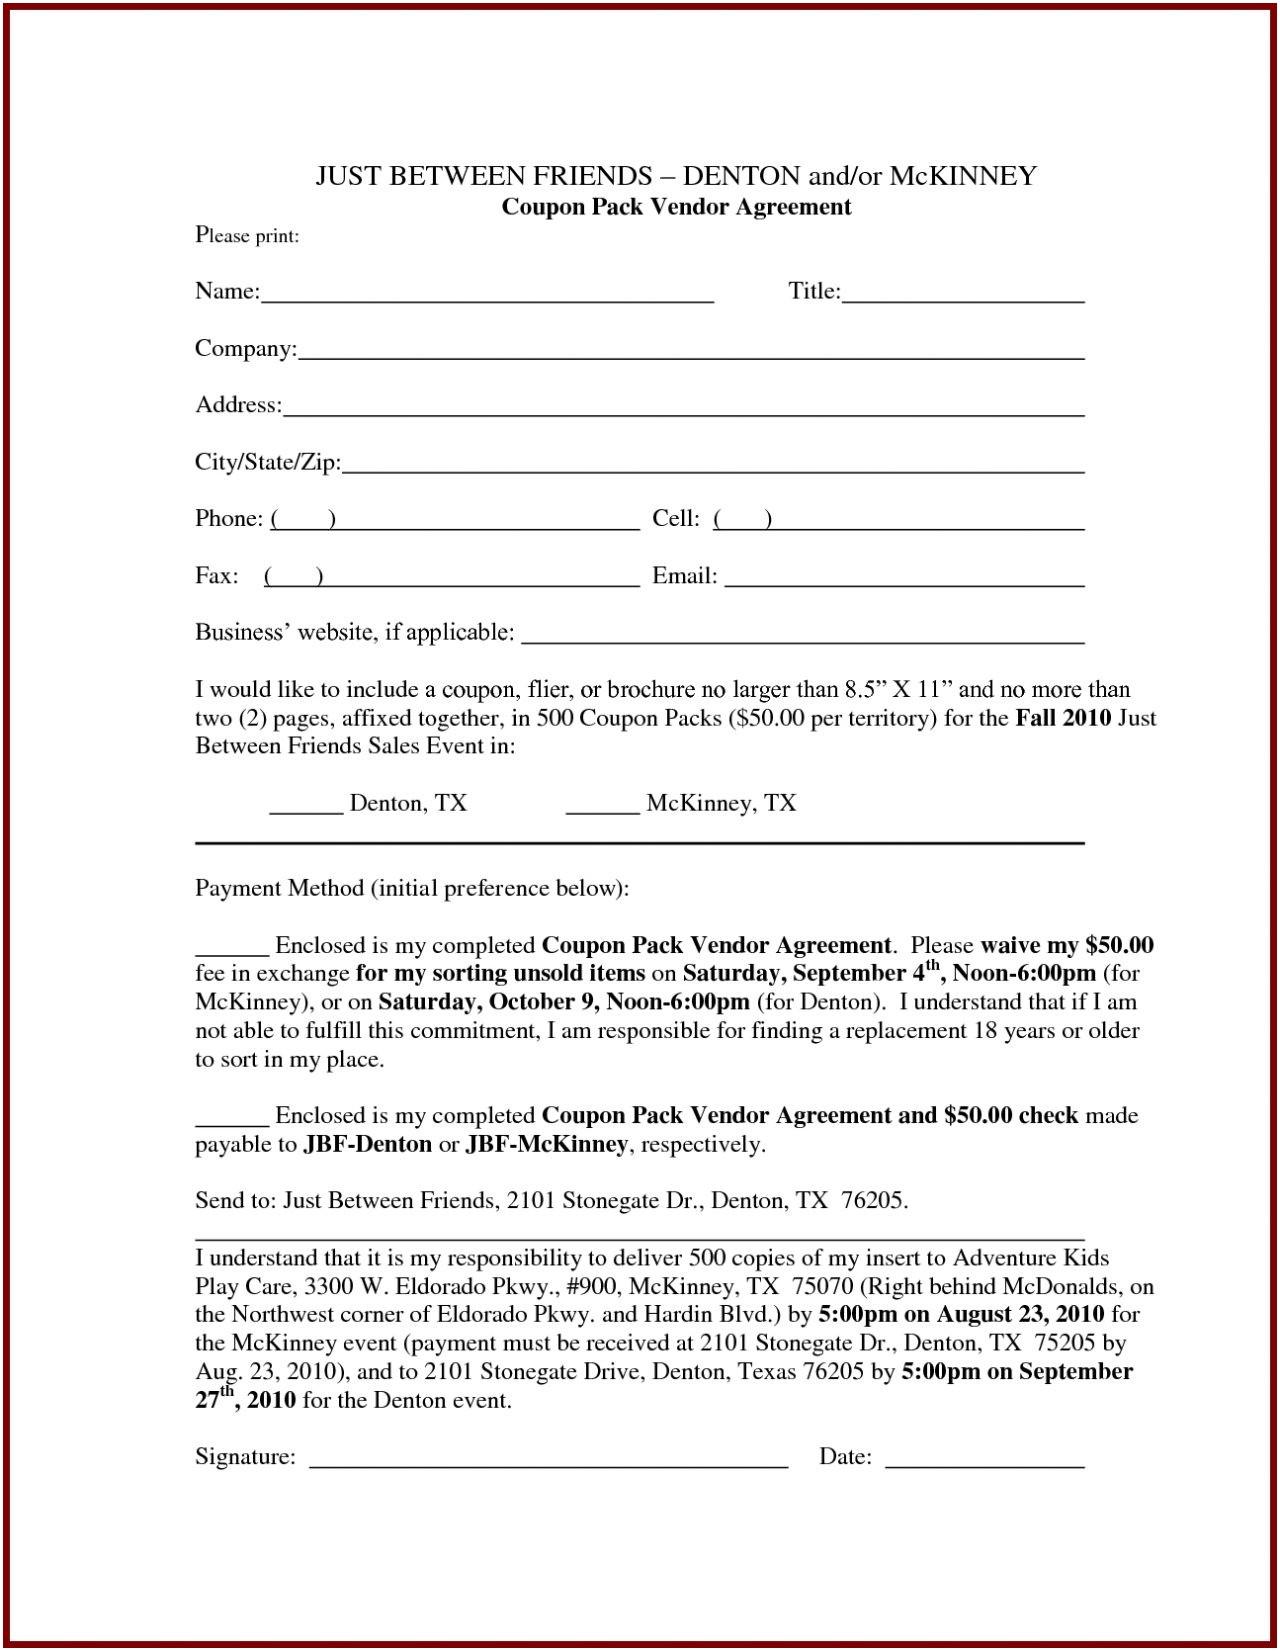 California Prenuptial Agreement Form 9 Sample Free Prenuptial - Free Printable Prenuptial Agreement Form